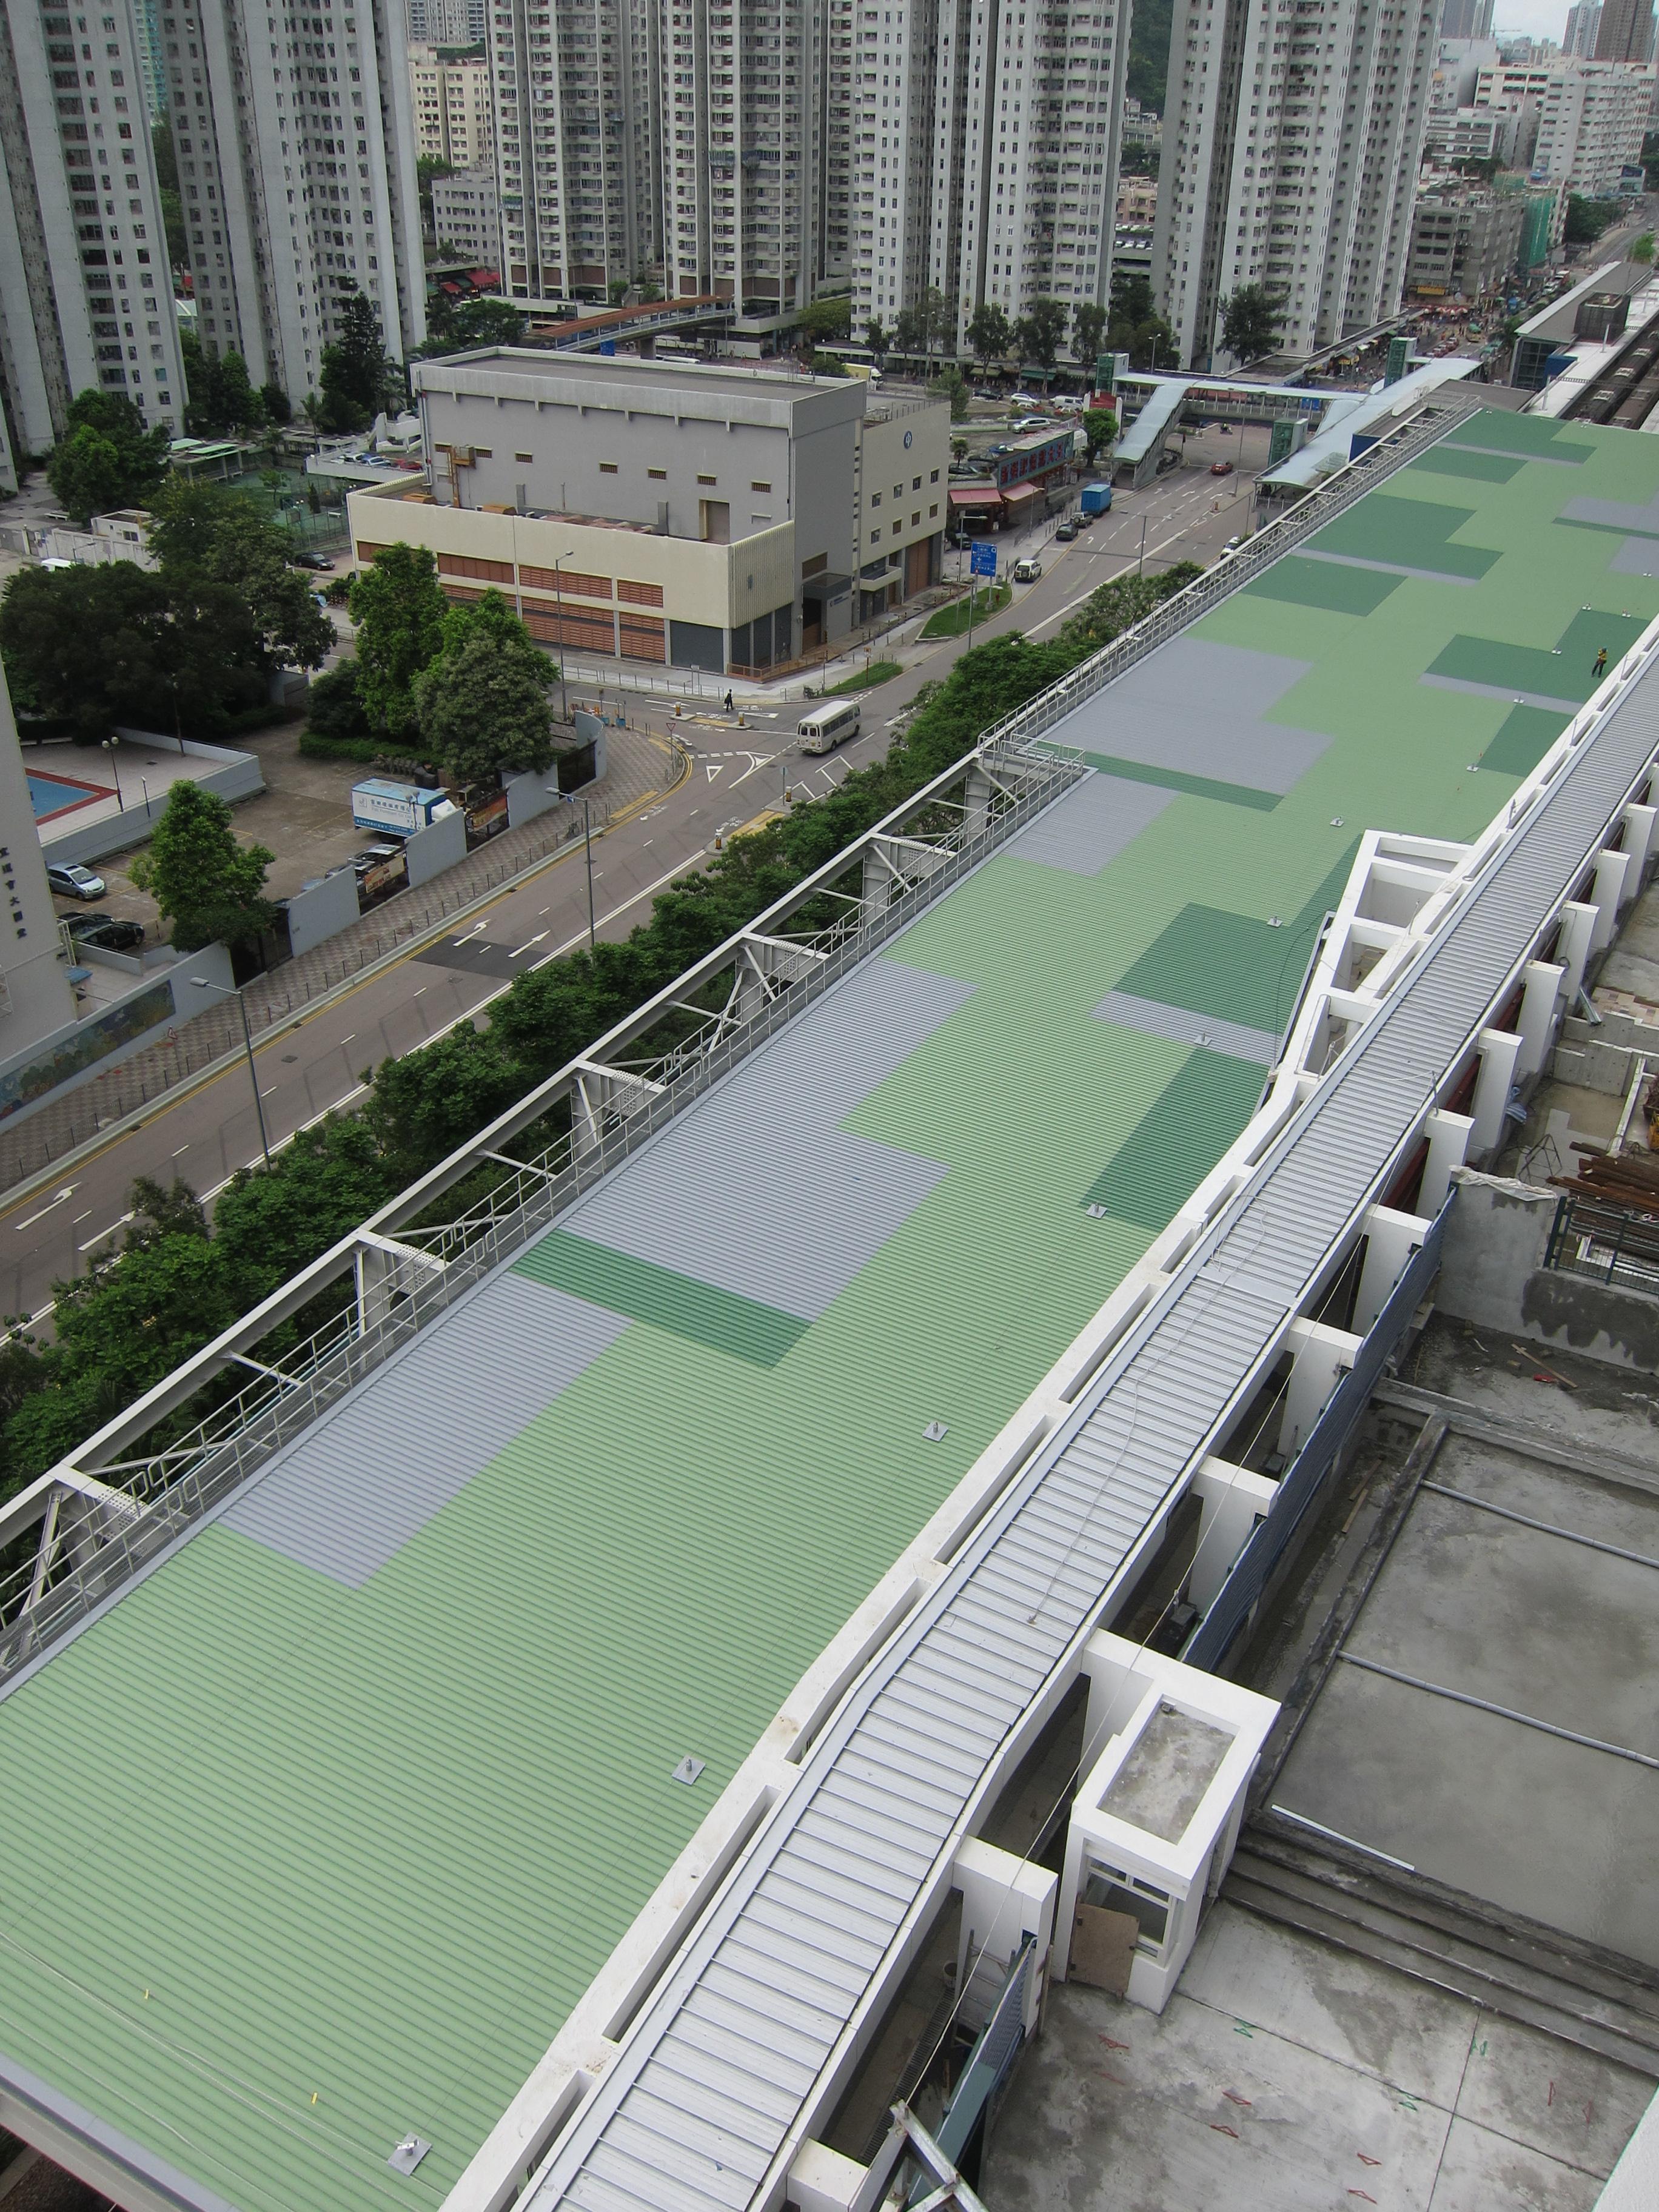 Tai Wan Noise Barrier20110718 Tai Wan Noise Barrier Kliplok